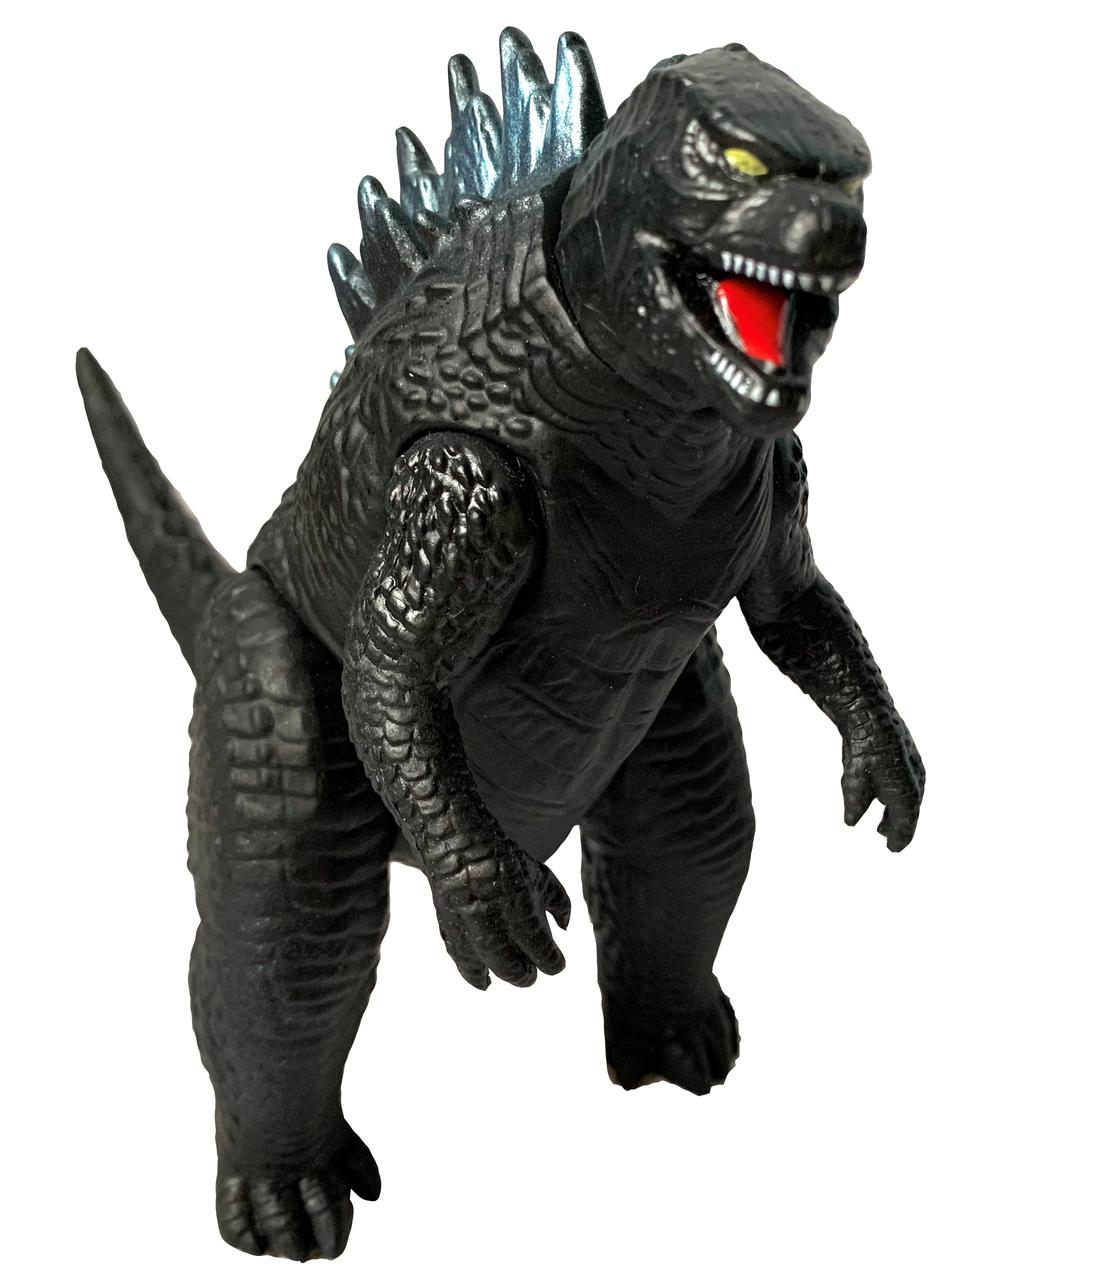 Игрушка-фигурка Годзилла, Король Монстров, 16 см - Godzilla,King of the Monsters